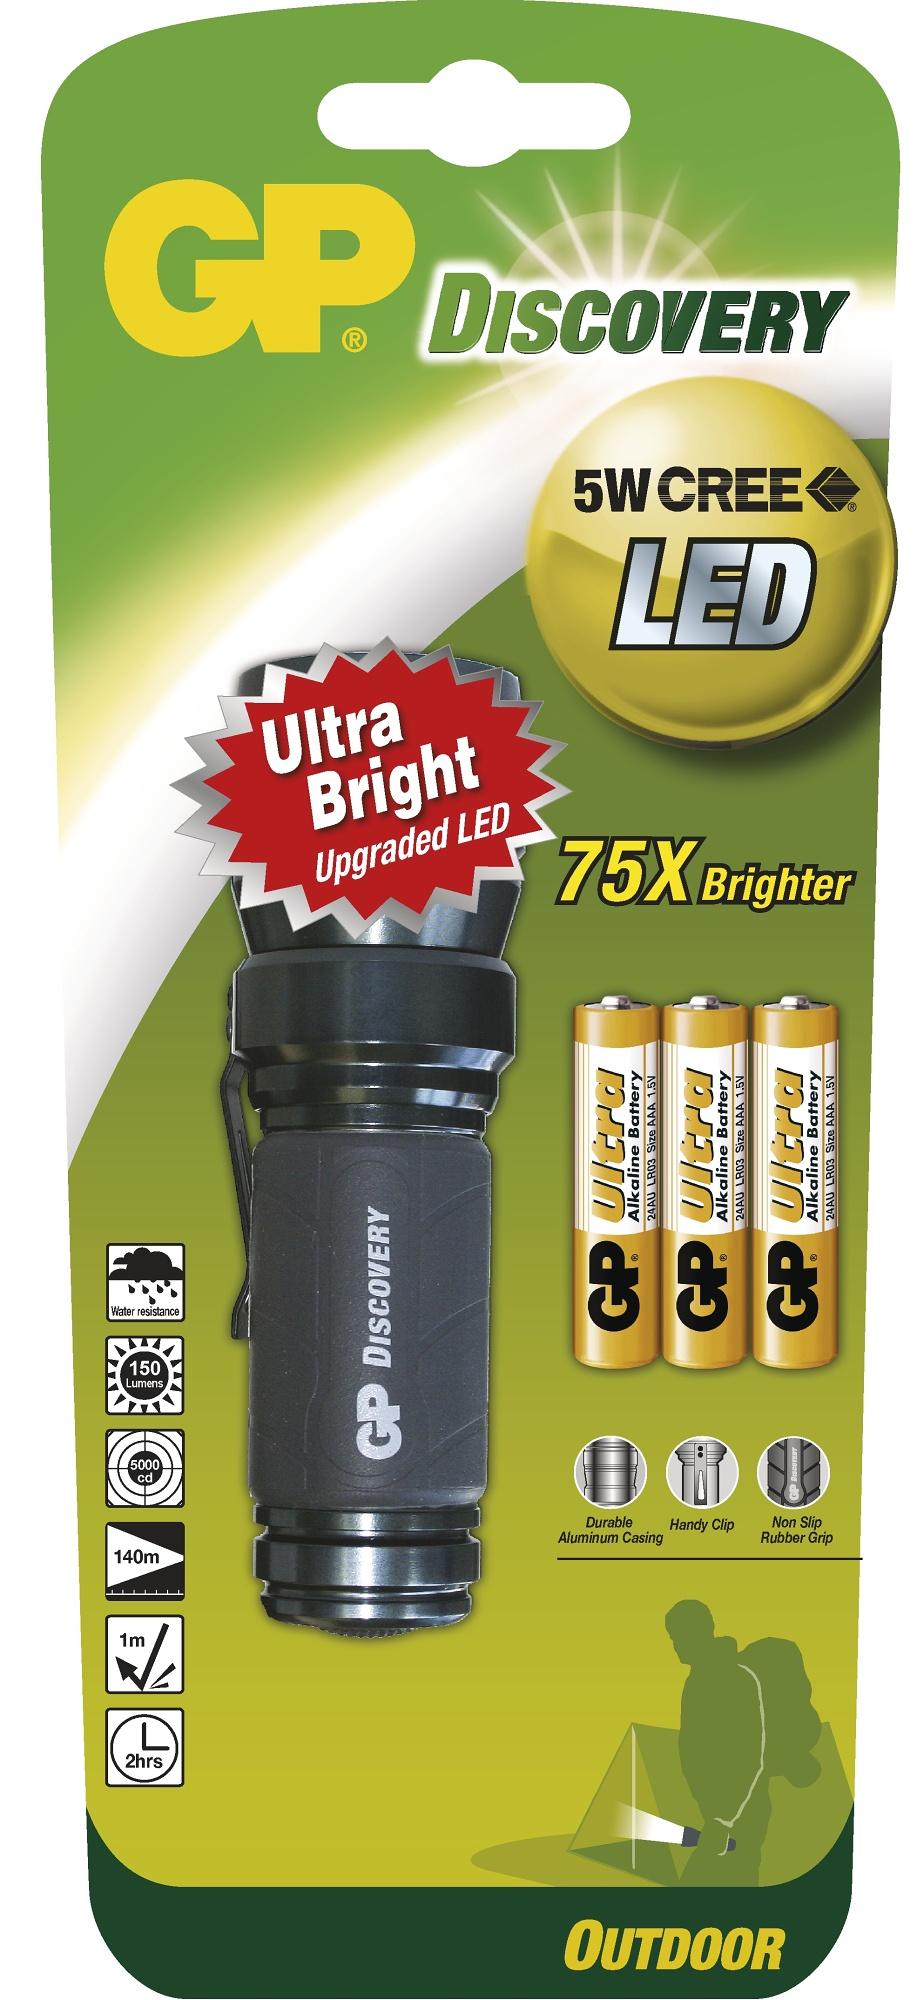 Značková LED svítilna GP LOE203 Discovery Outdoor - 5 Watt CREE, 3× AAA